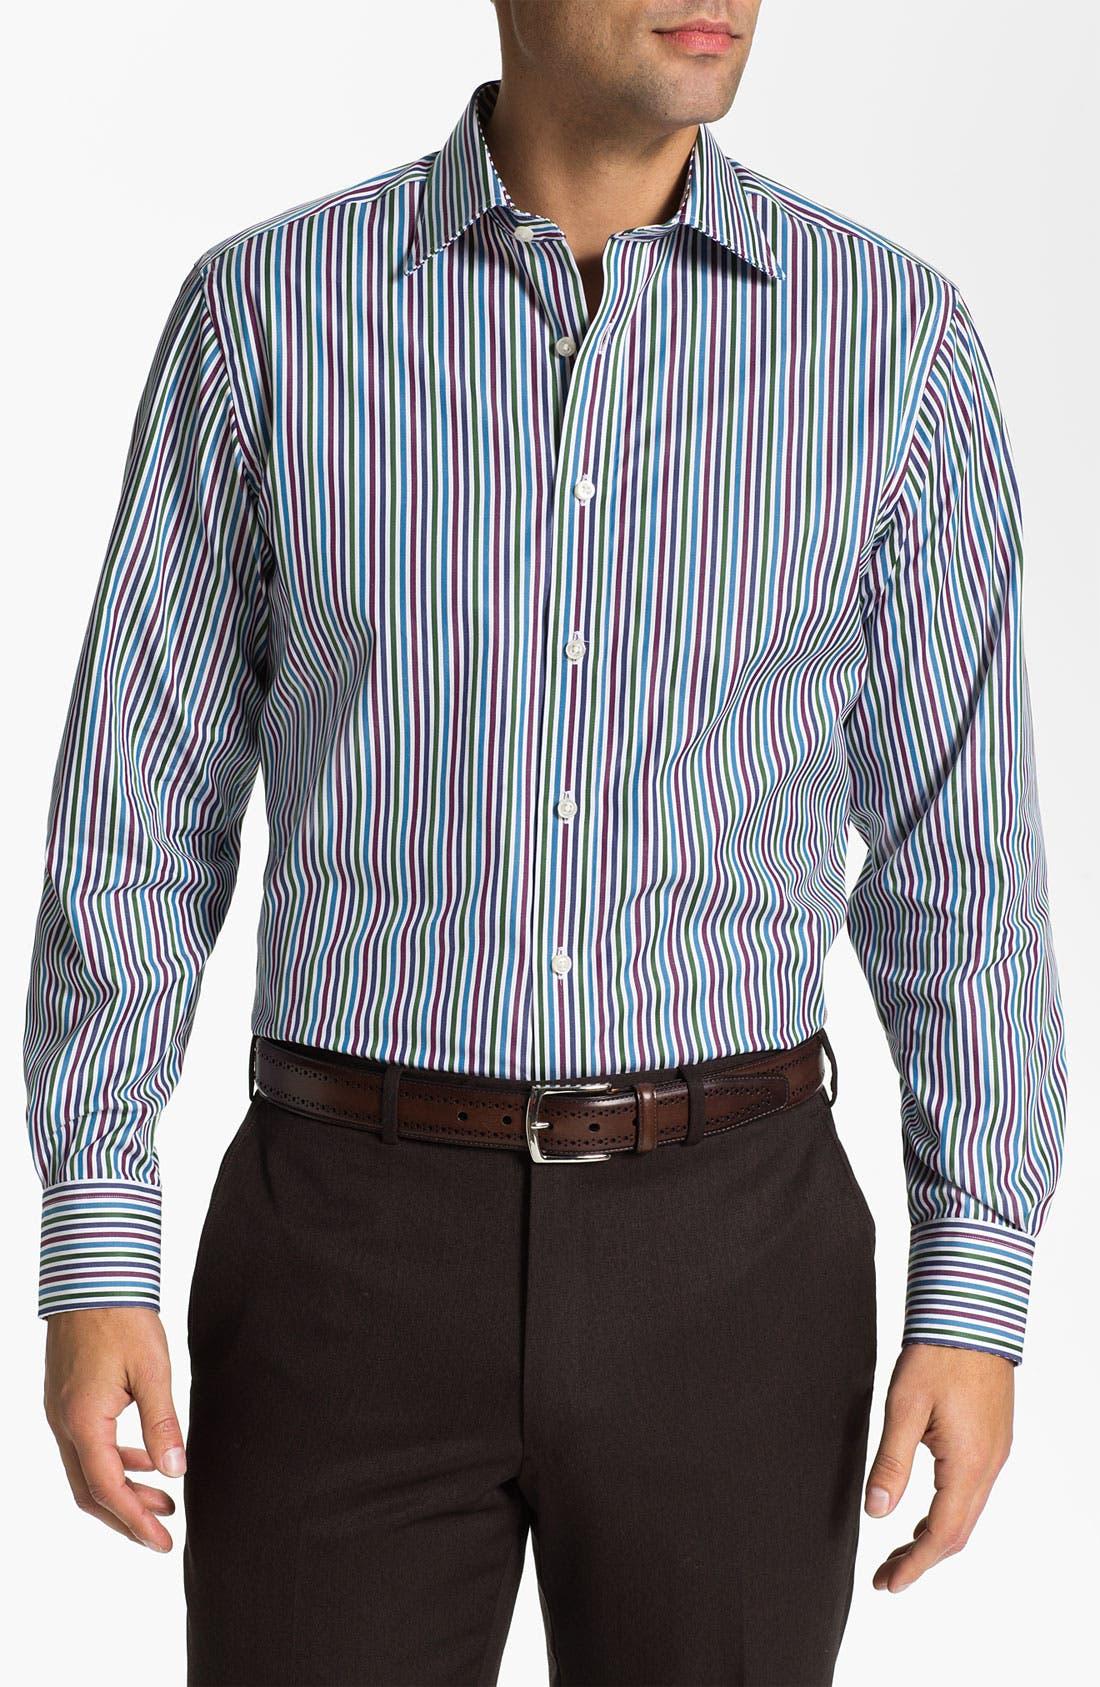 Alternate Image 1 Selected - Maker & Company Regular Fit Sport Shirt (Online Exclusive)